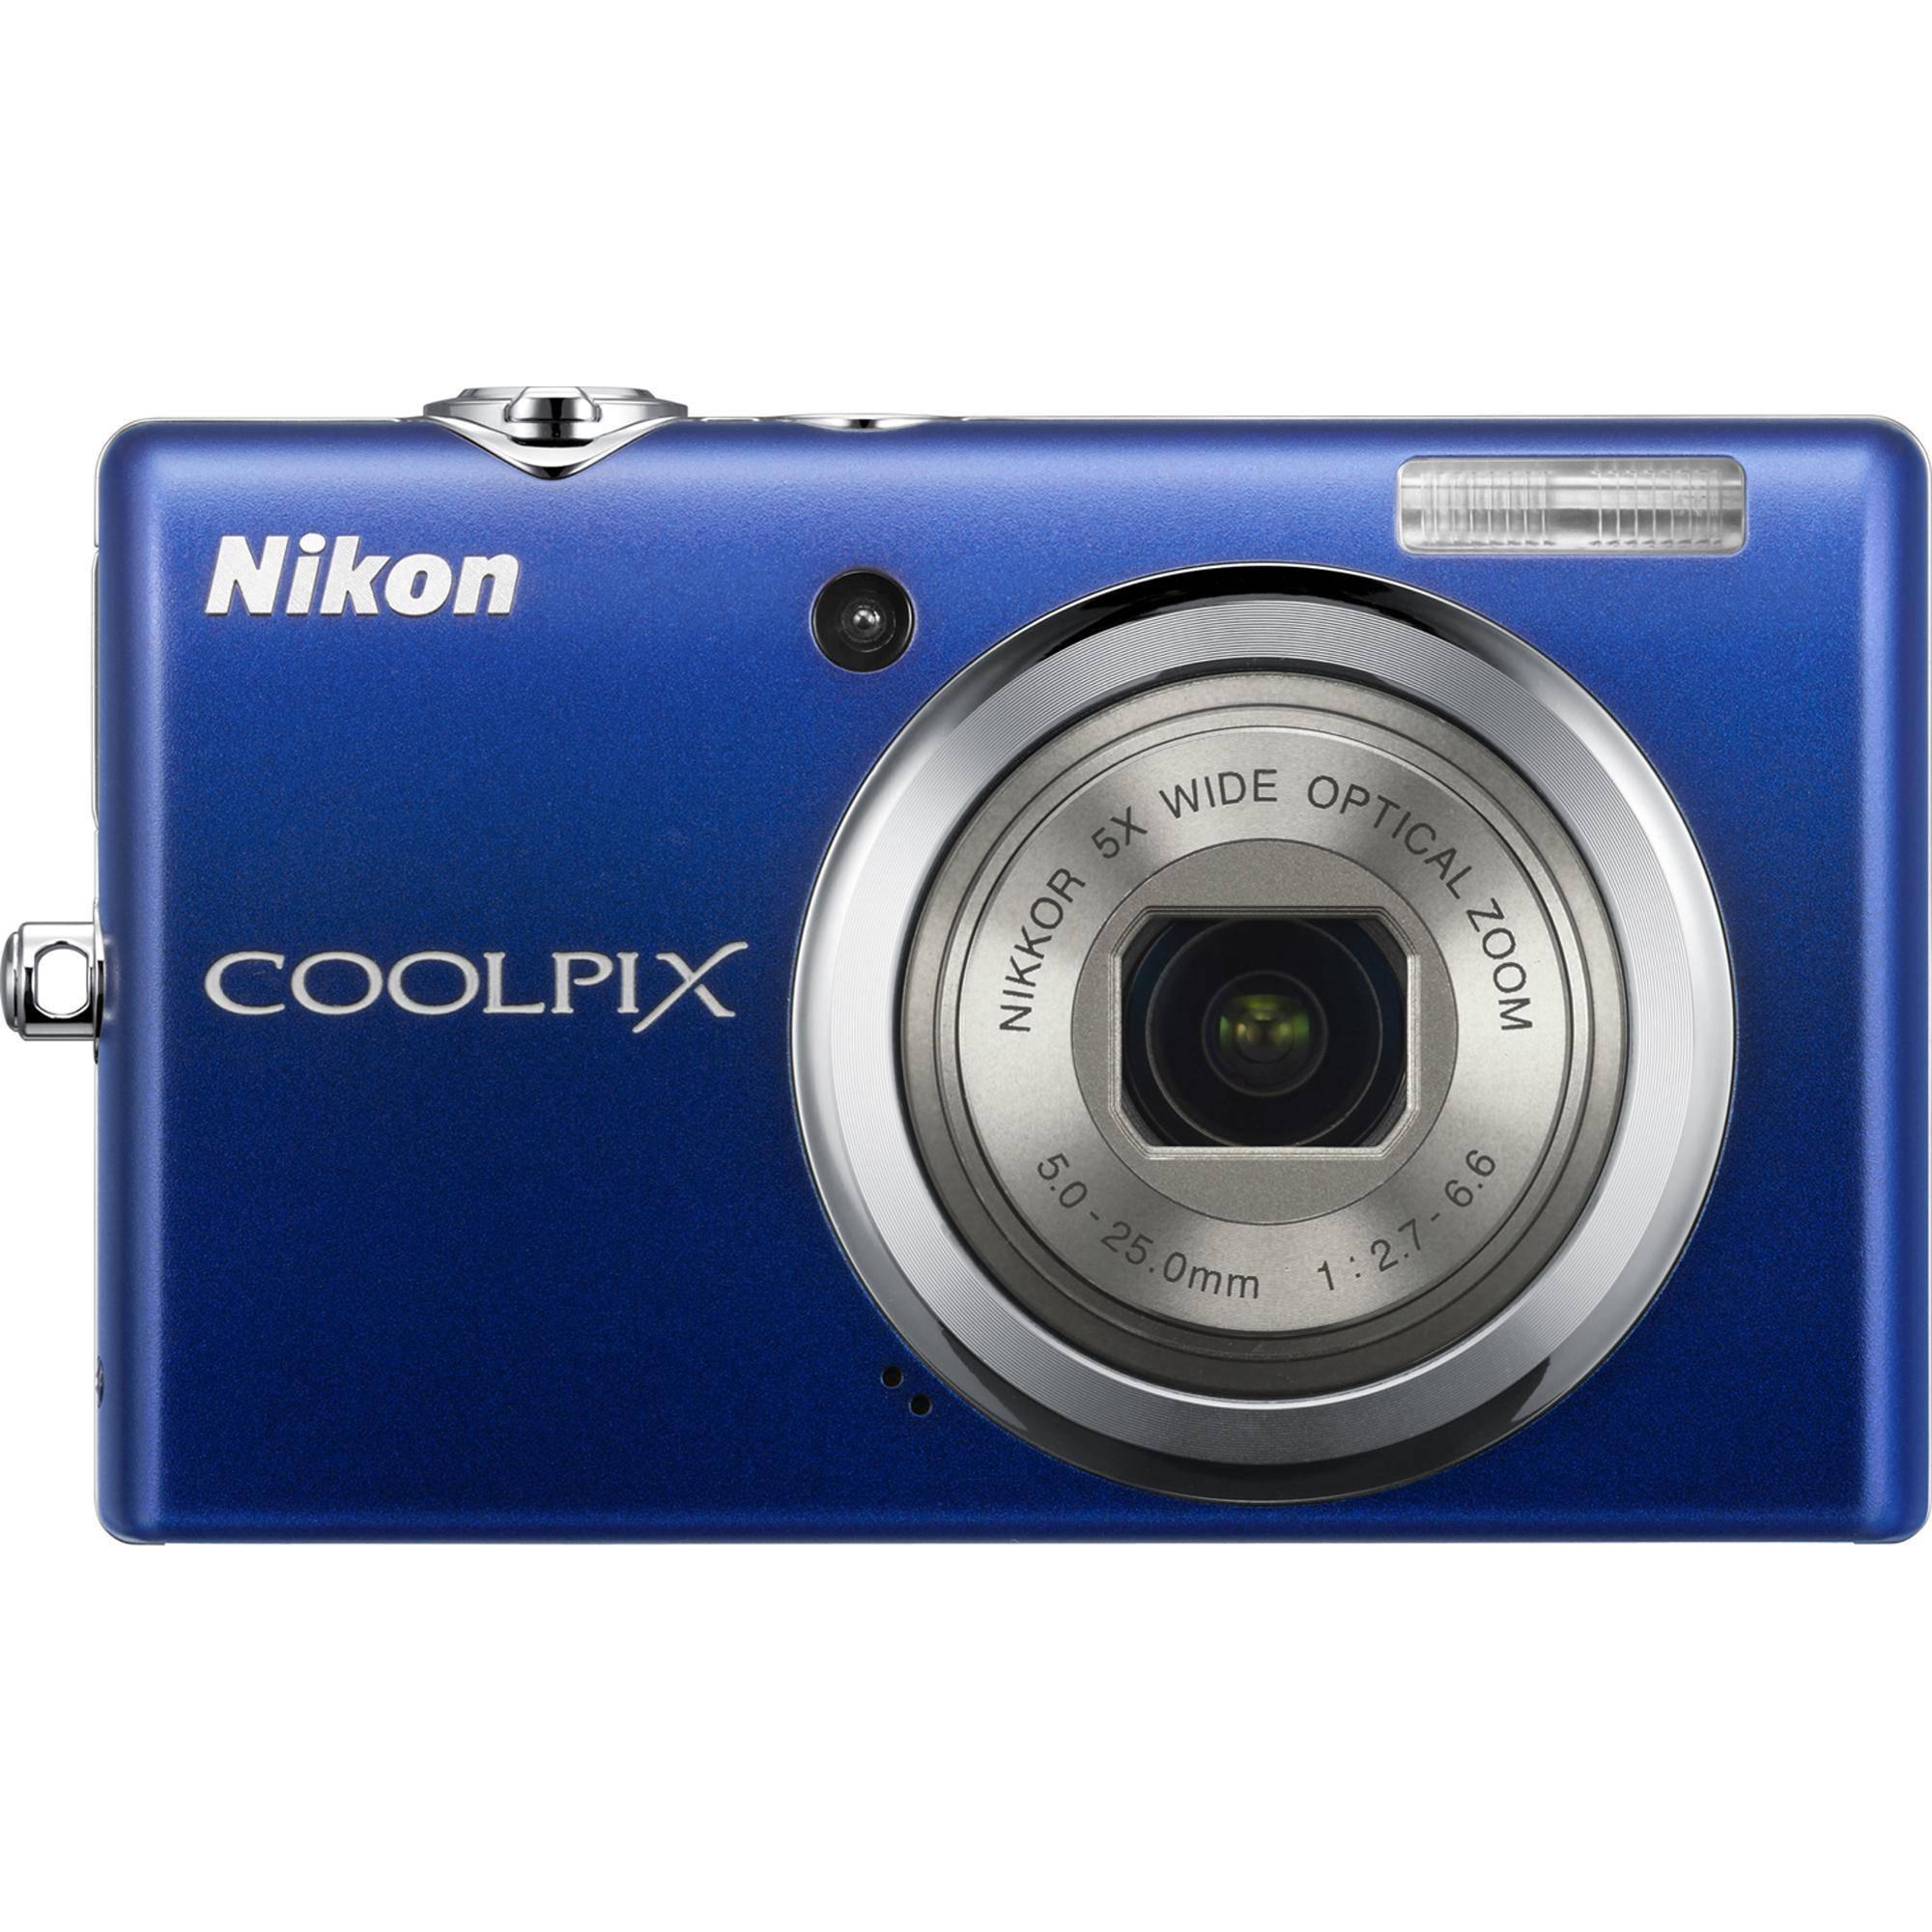 nikon coolpix s570 digital camera blue 26179 b h photo video rh bhphotovideo com